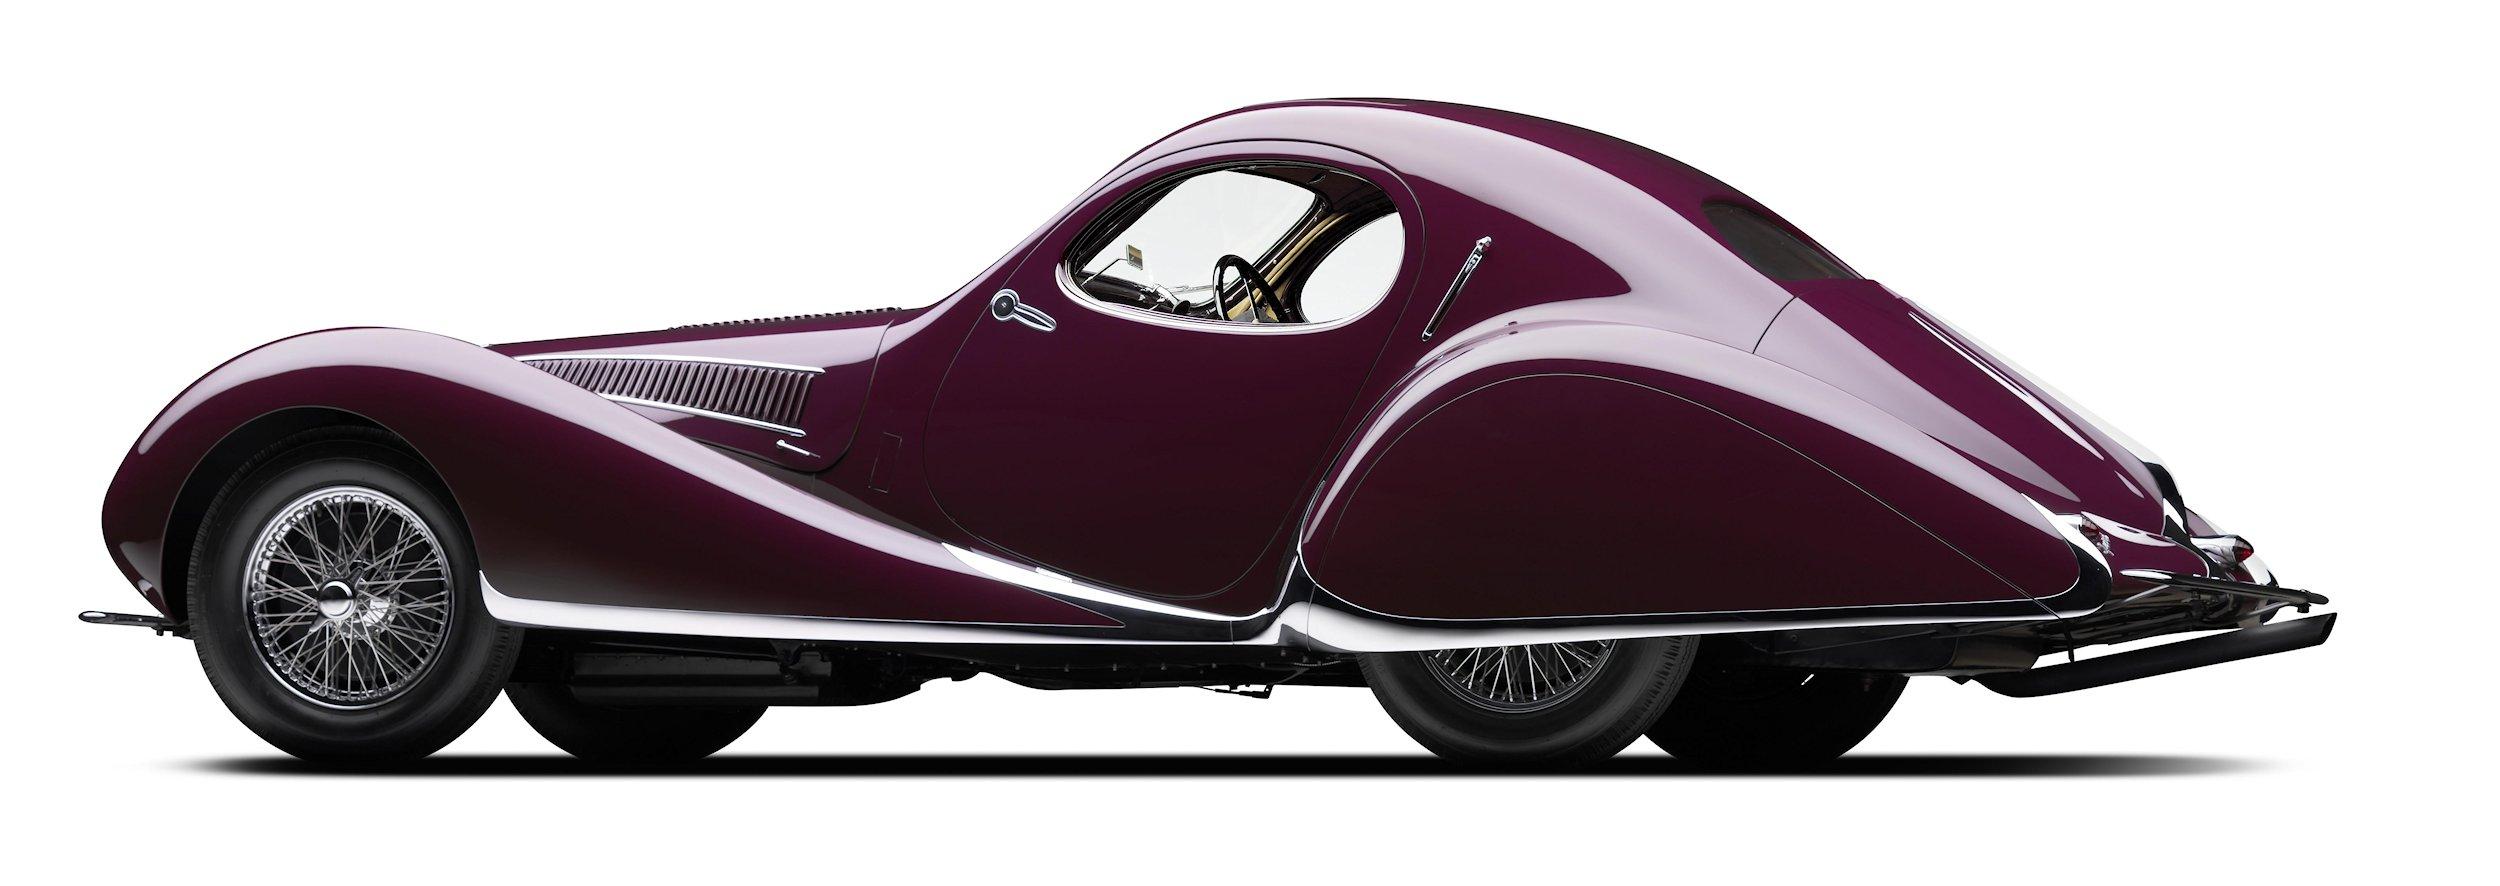 1937 Talbot Lago T150CSS-rear 3q